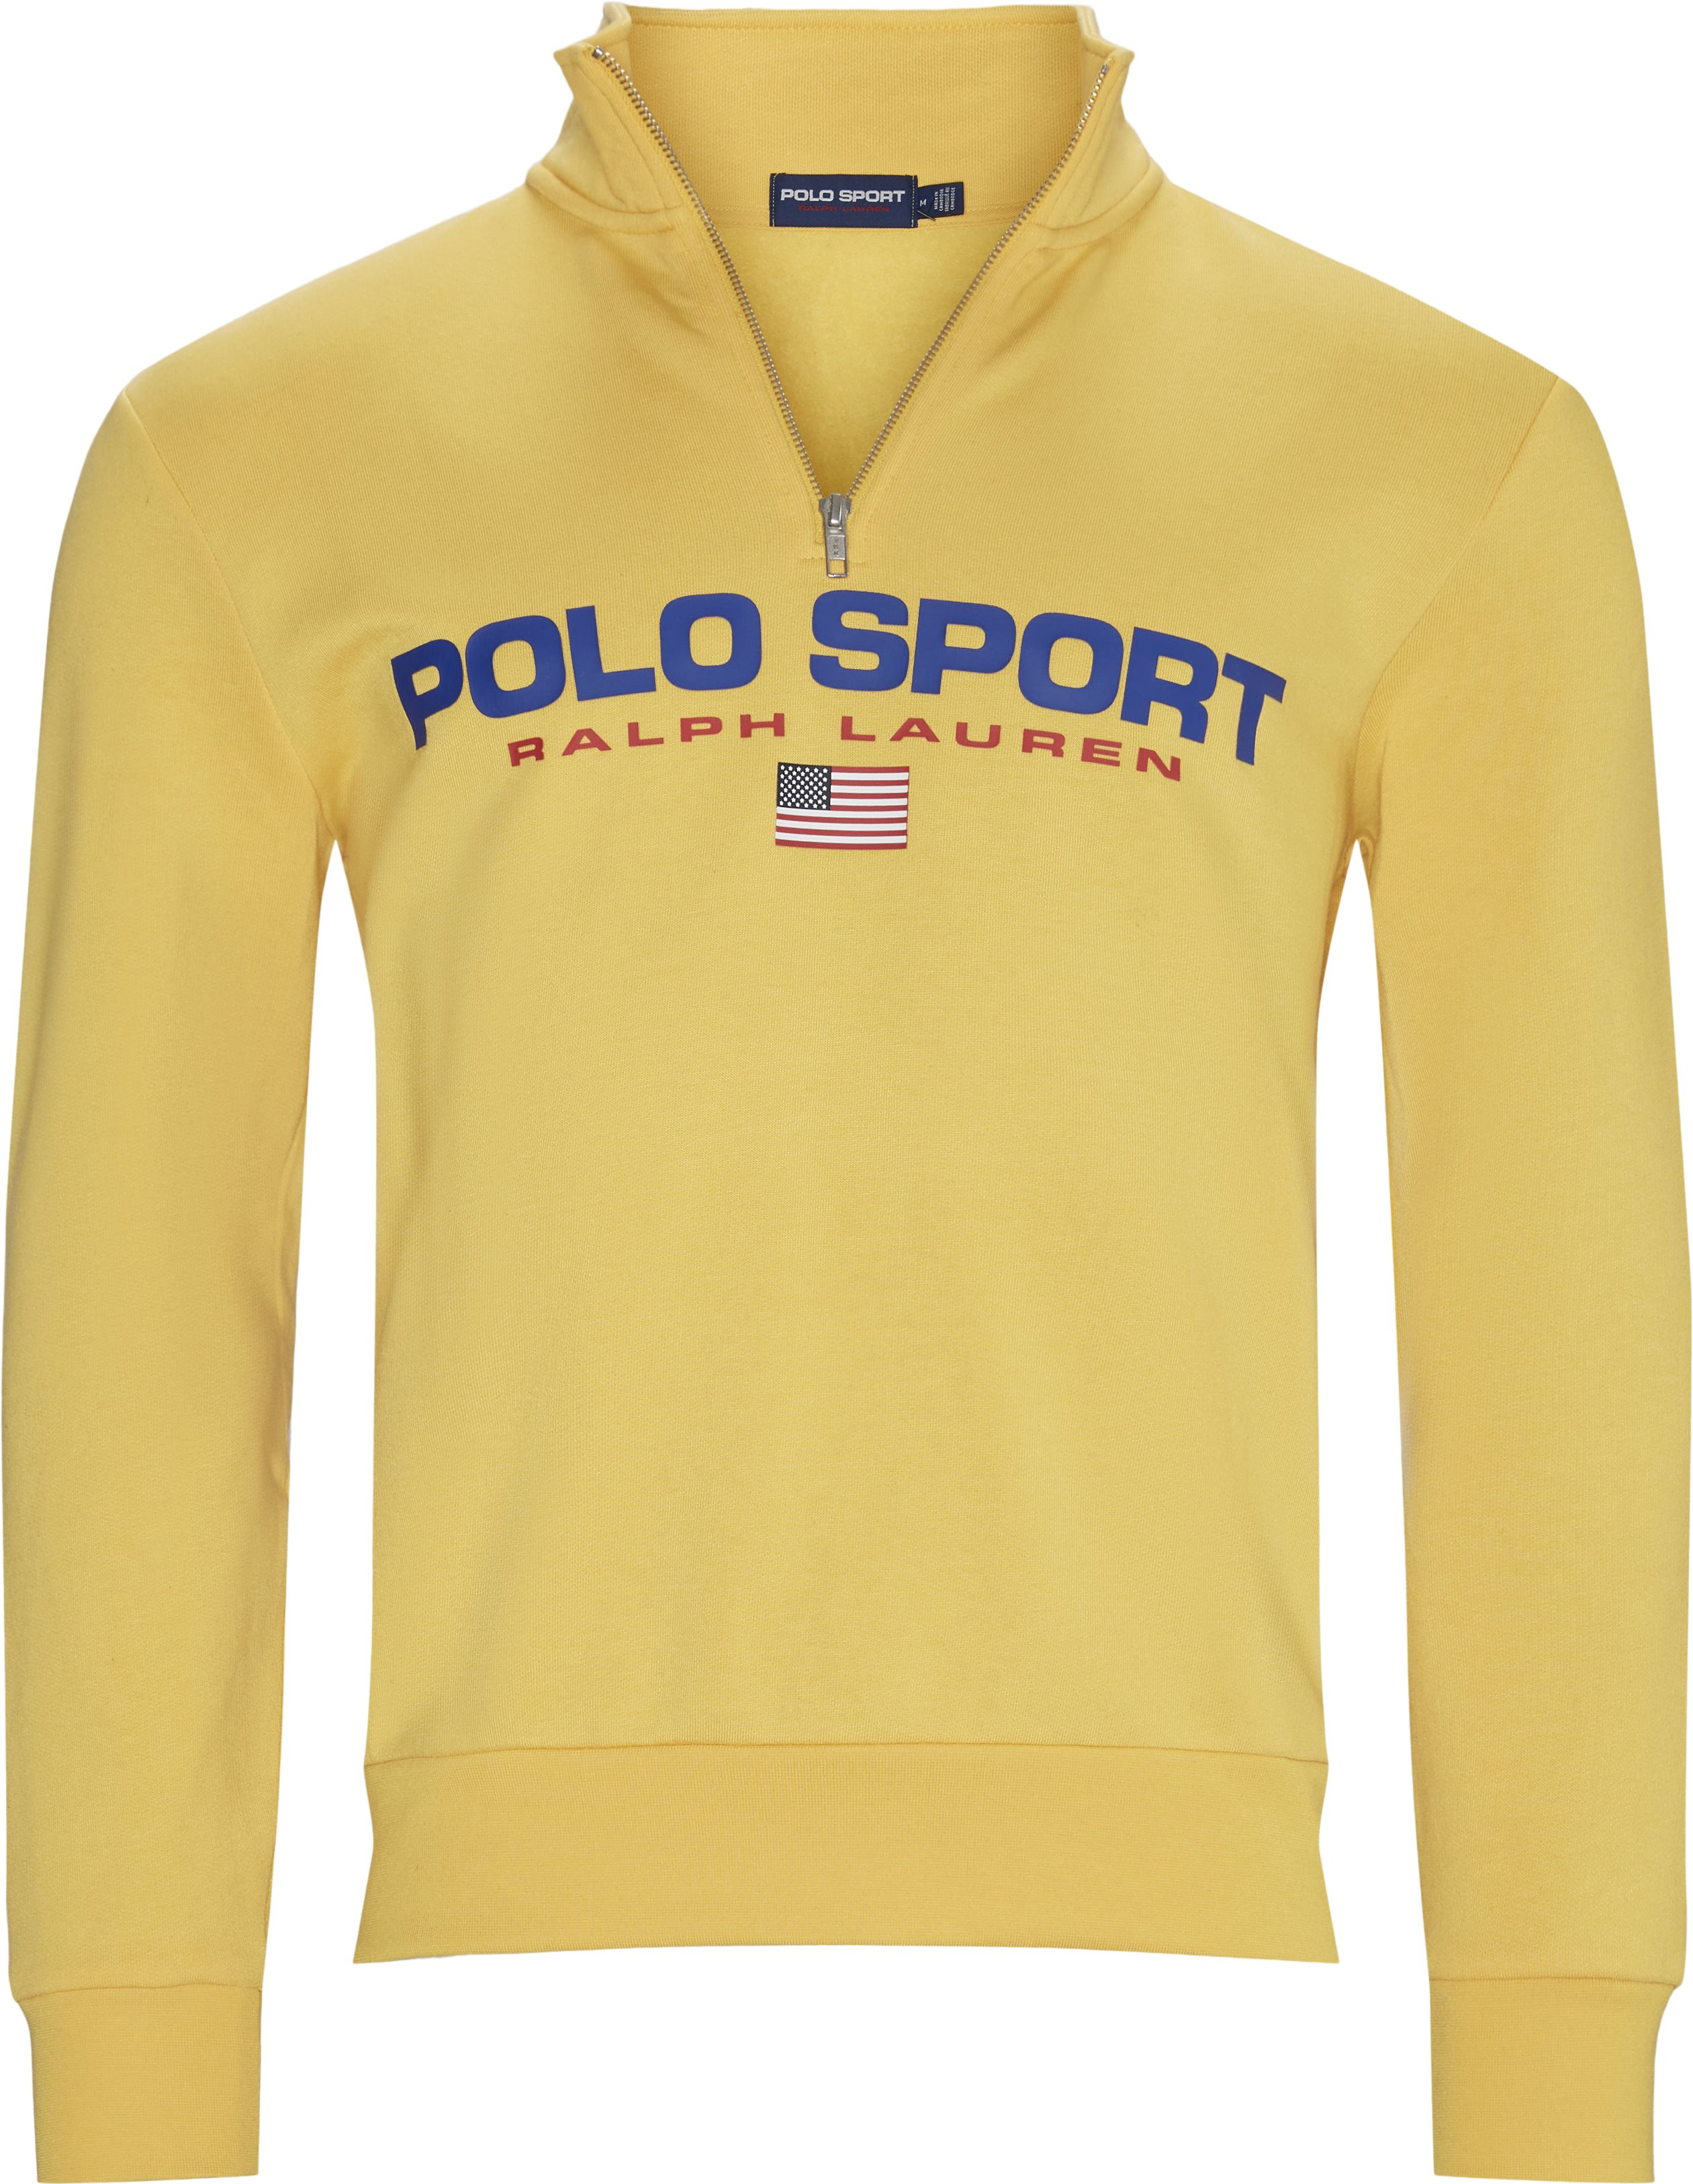 Polo Sport Half-Zip Sweatshirt - Sweatshirts - Regular - Gul